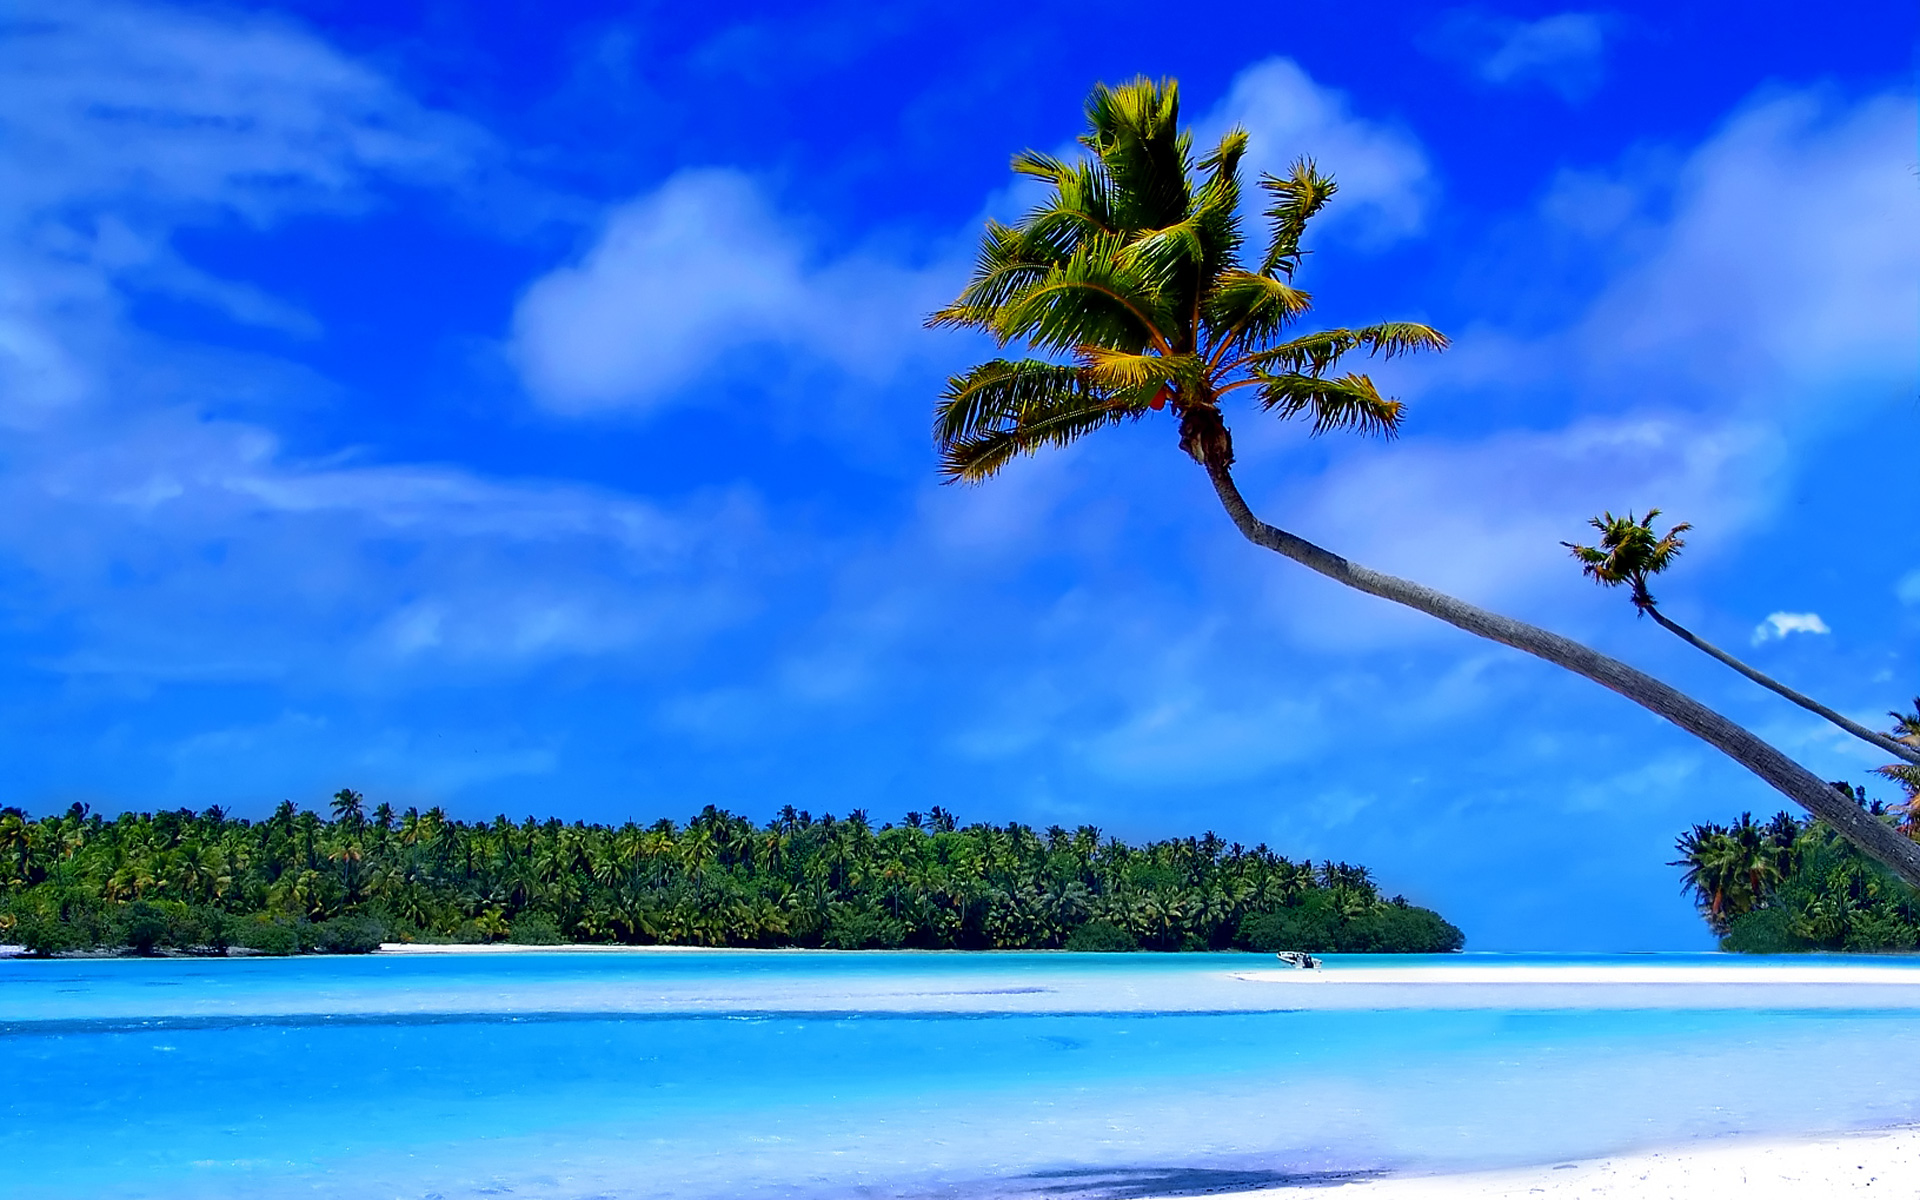 Caribbean Beaches Islands: The Caribbean Islands Wallpaper